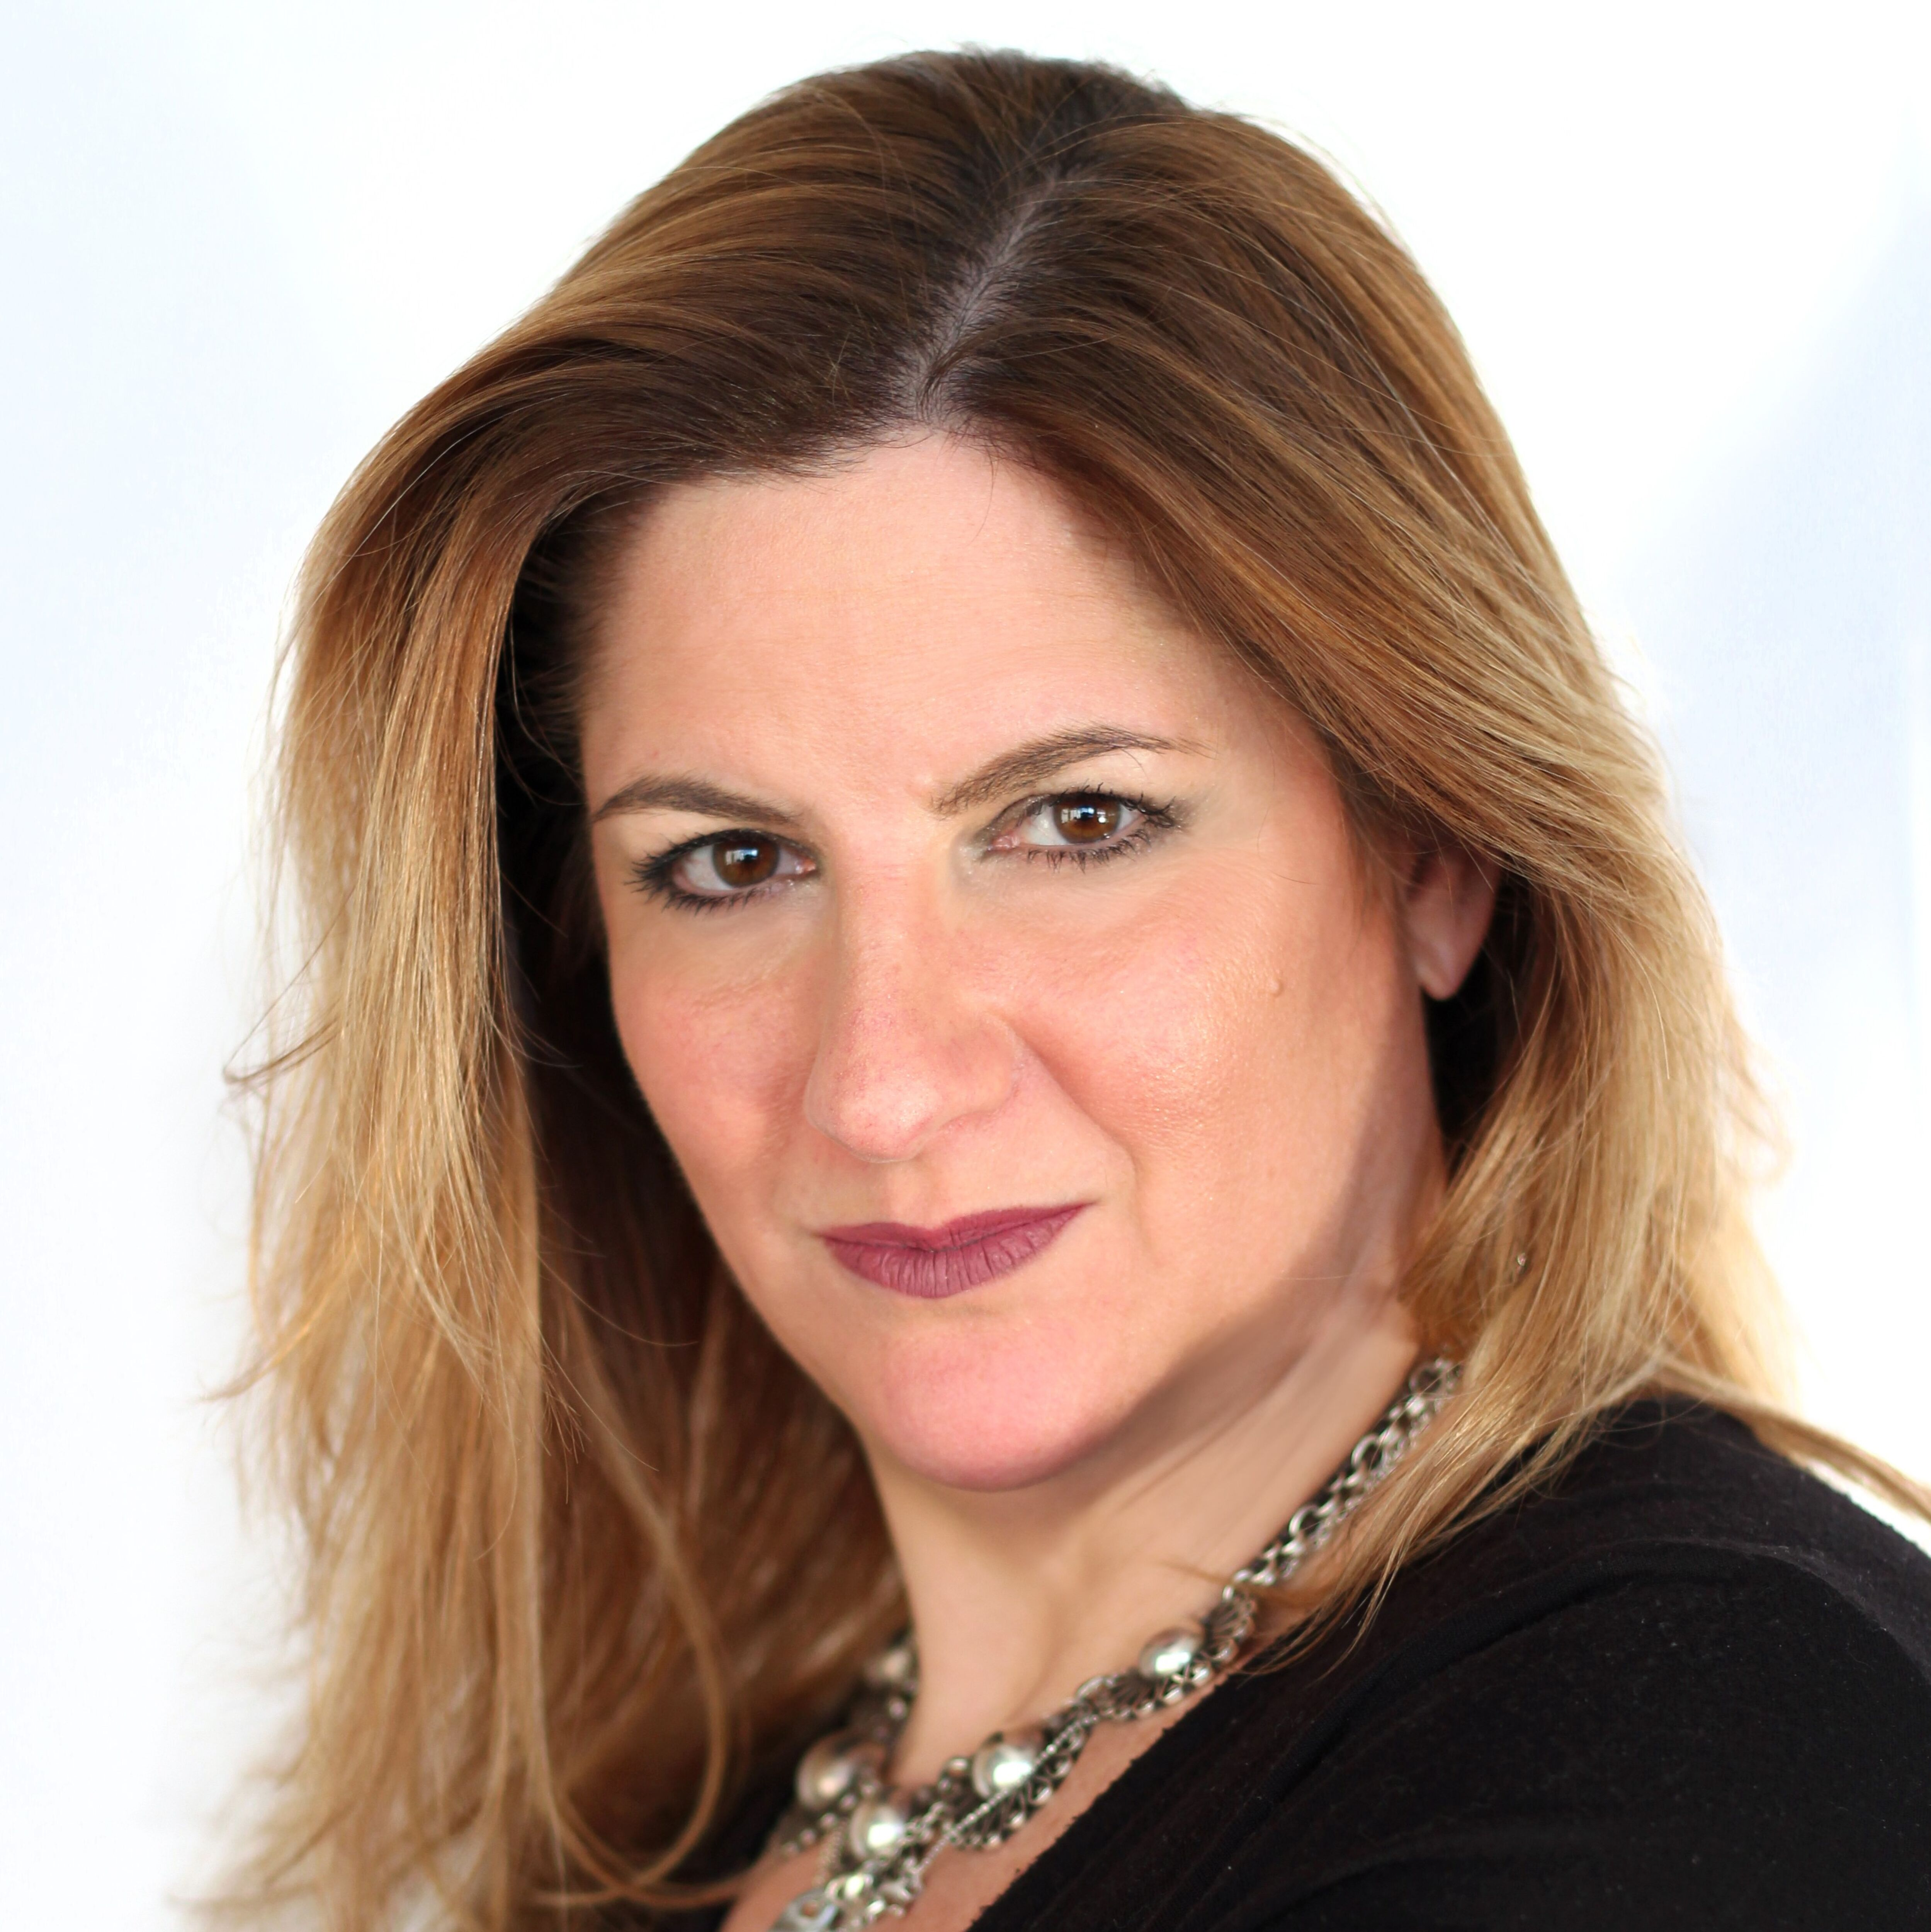 Adriana Waterston